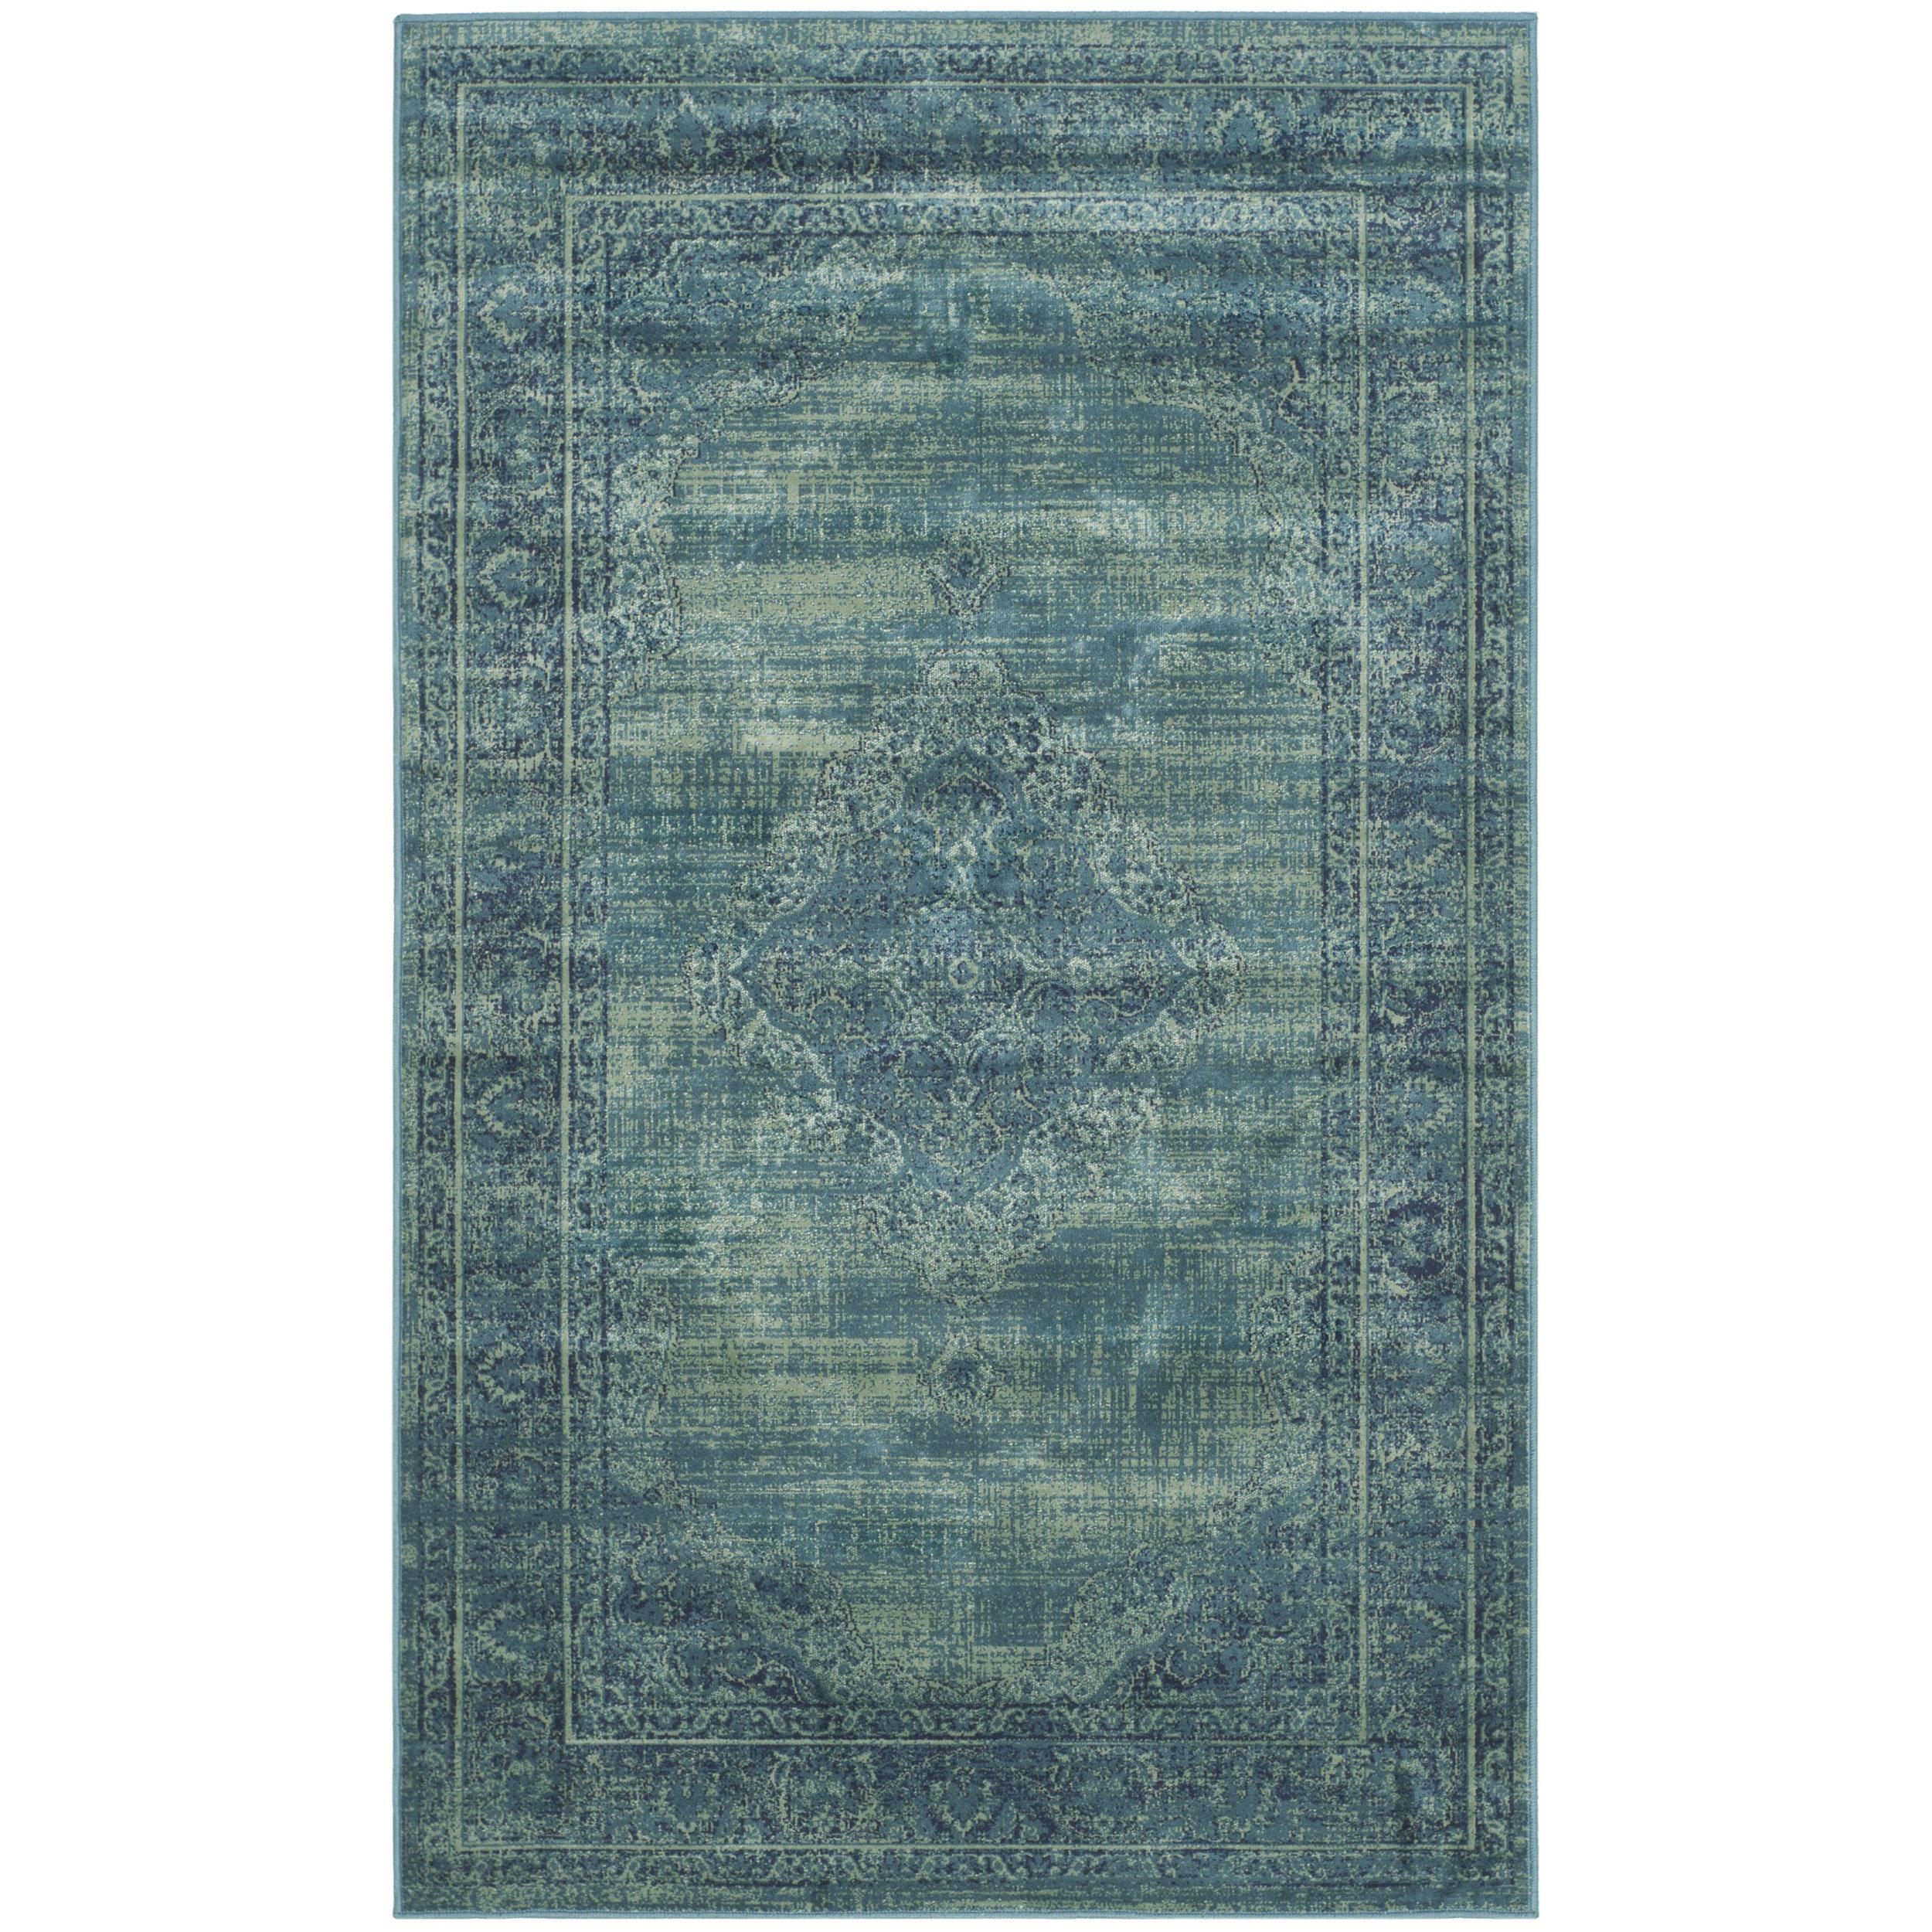 Mistana Makenna Turquoise Area Rug & Reviews | Wayfair